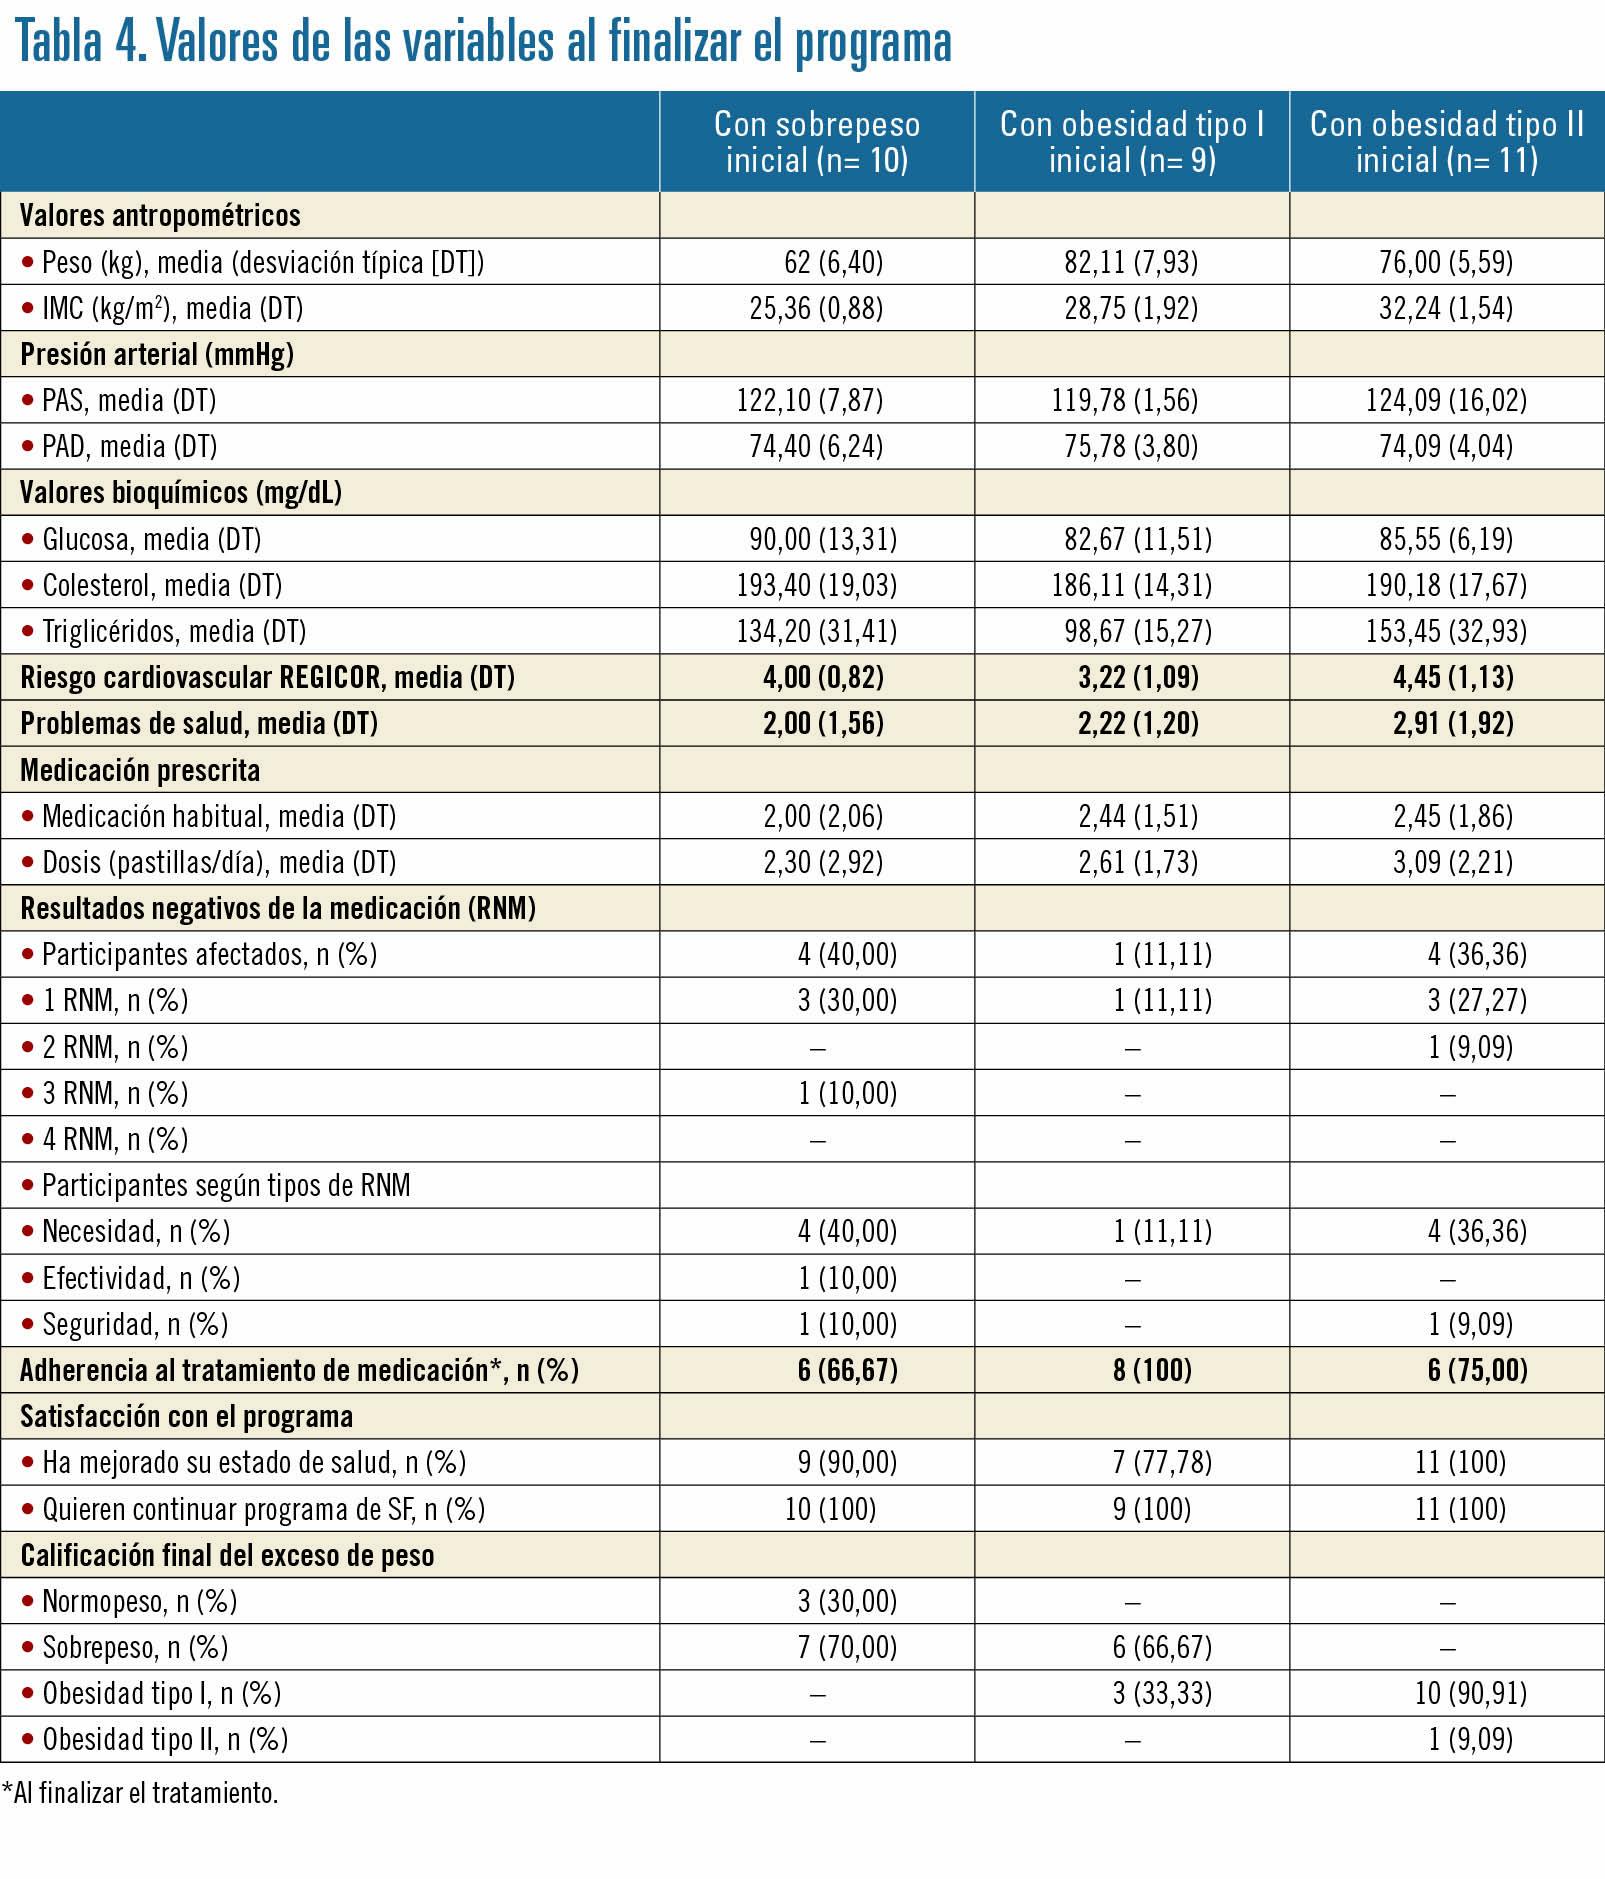 27 EF582 OFICINA FARMACIA ANALISIS tabla 4